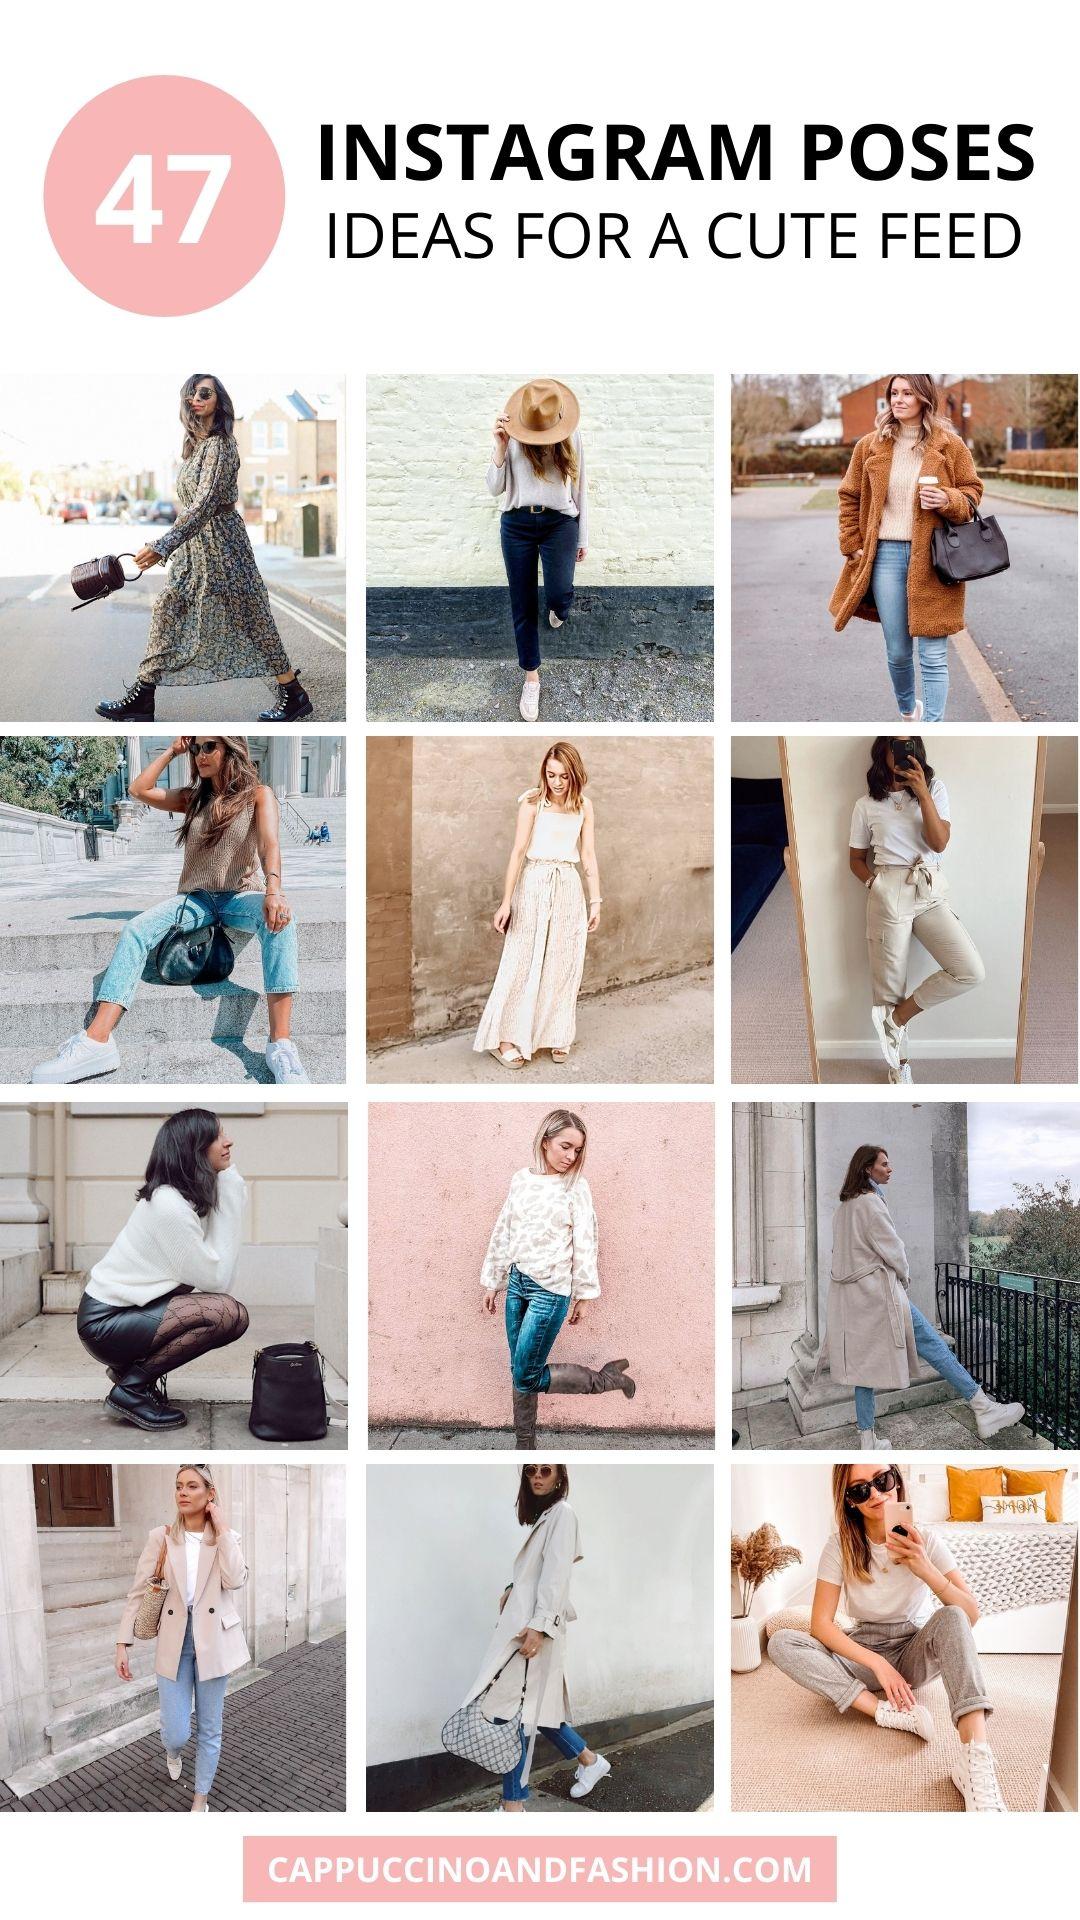 47 Instagram Poses Ideas for Cute Photos